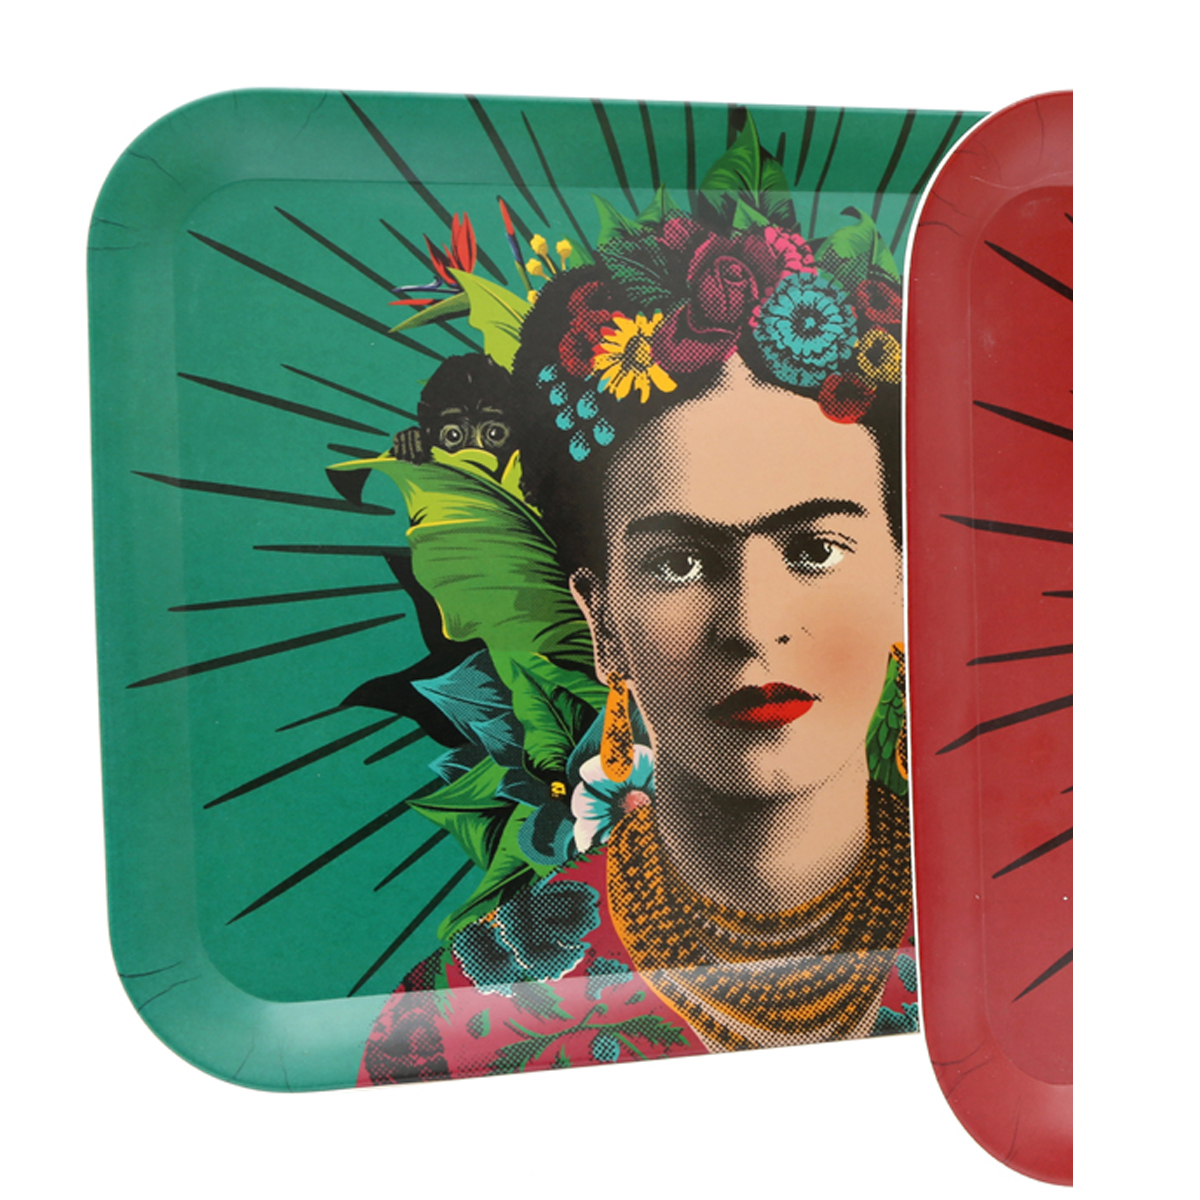 Grand plateau bambou \'Frida Kahlo\' vert - 43x32 cm - [A1402]